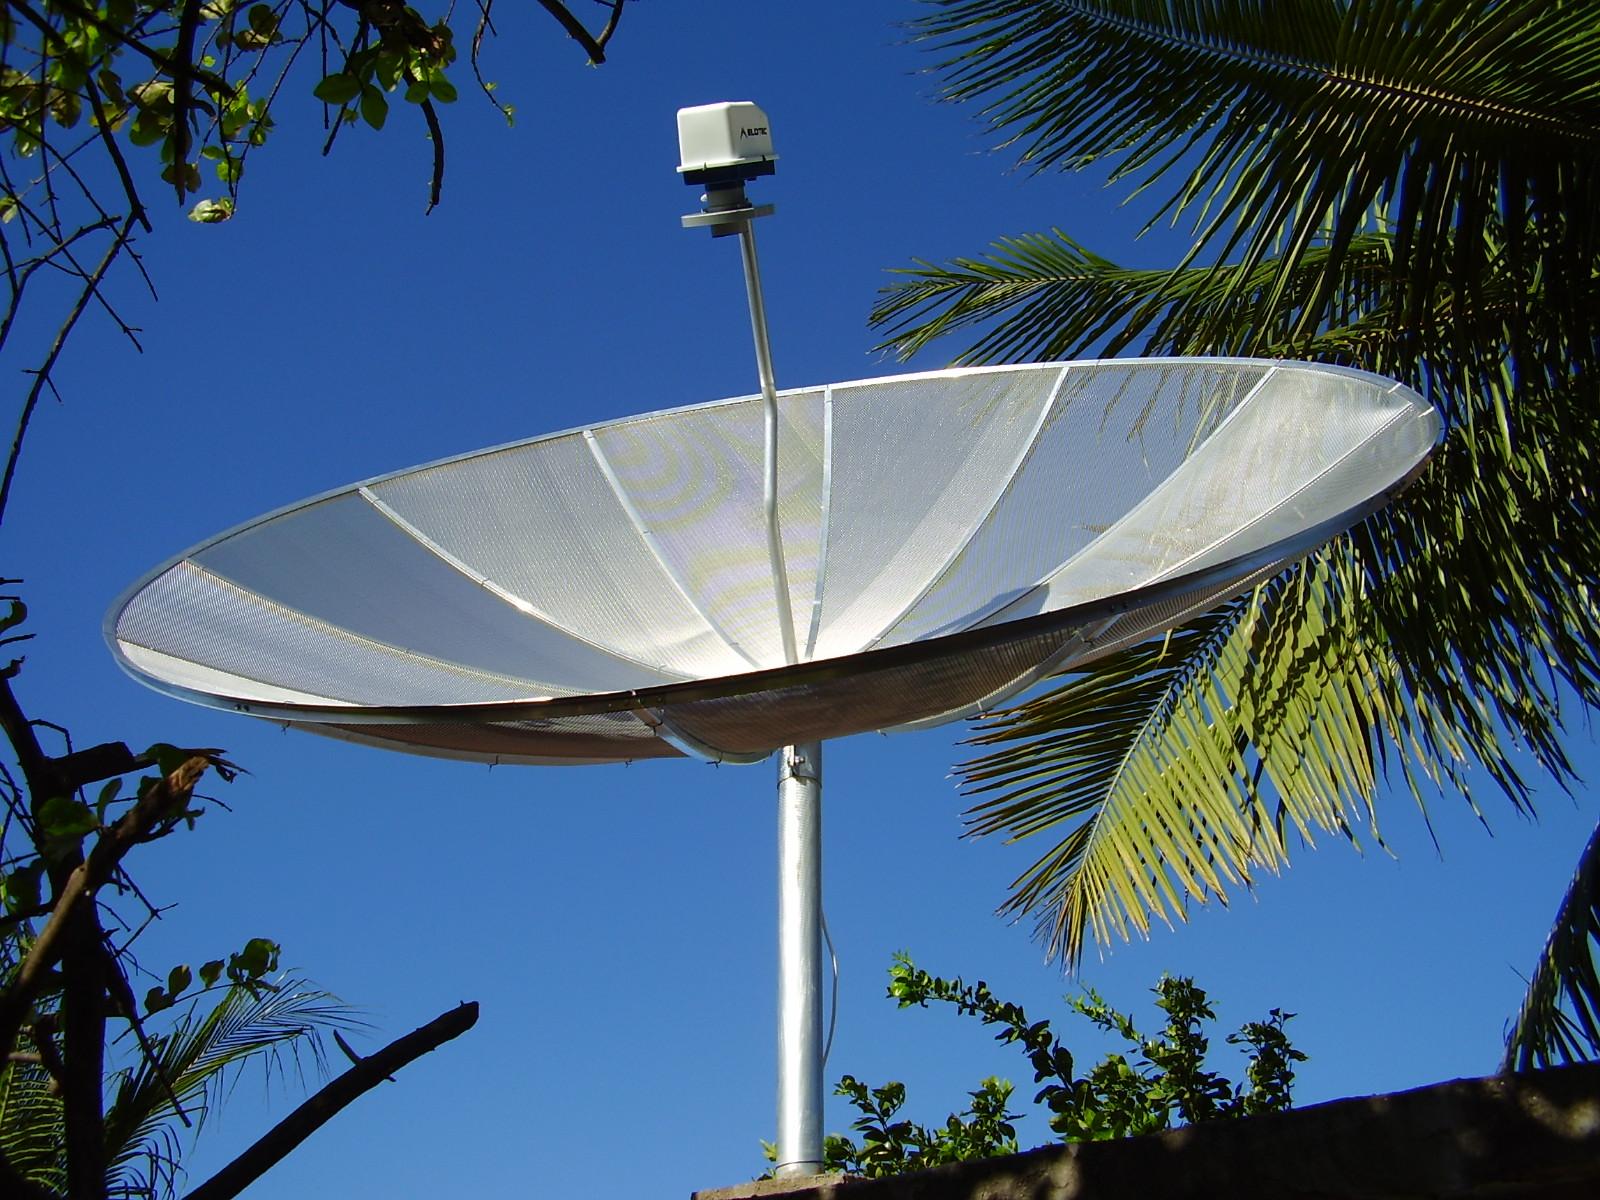 Resultado de imagen para Fotos de antenas parabólica